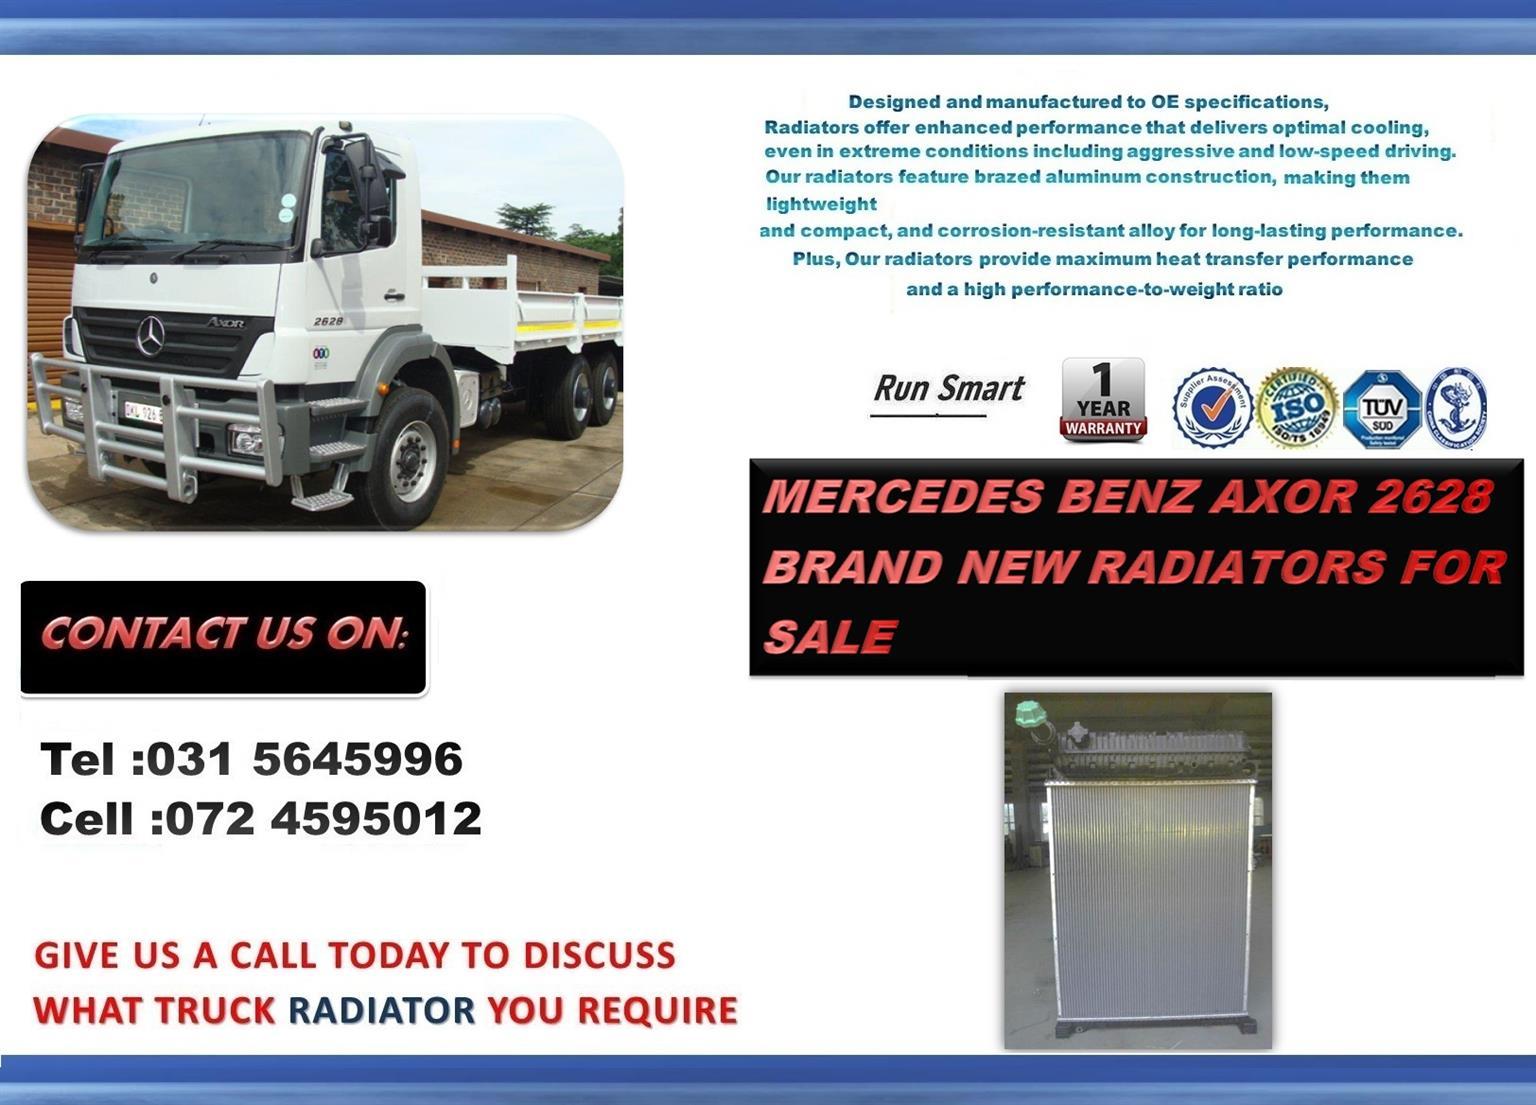 MERCEDES BENZ 2628 AXOR BRAND NEW RADIATORS FOR SALE PRICE: R10 000